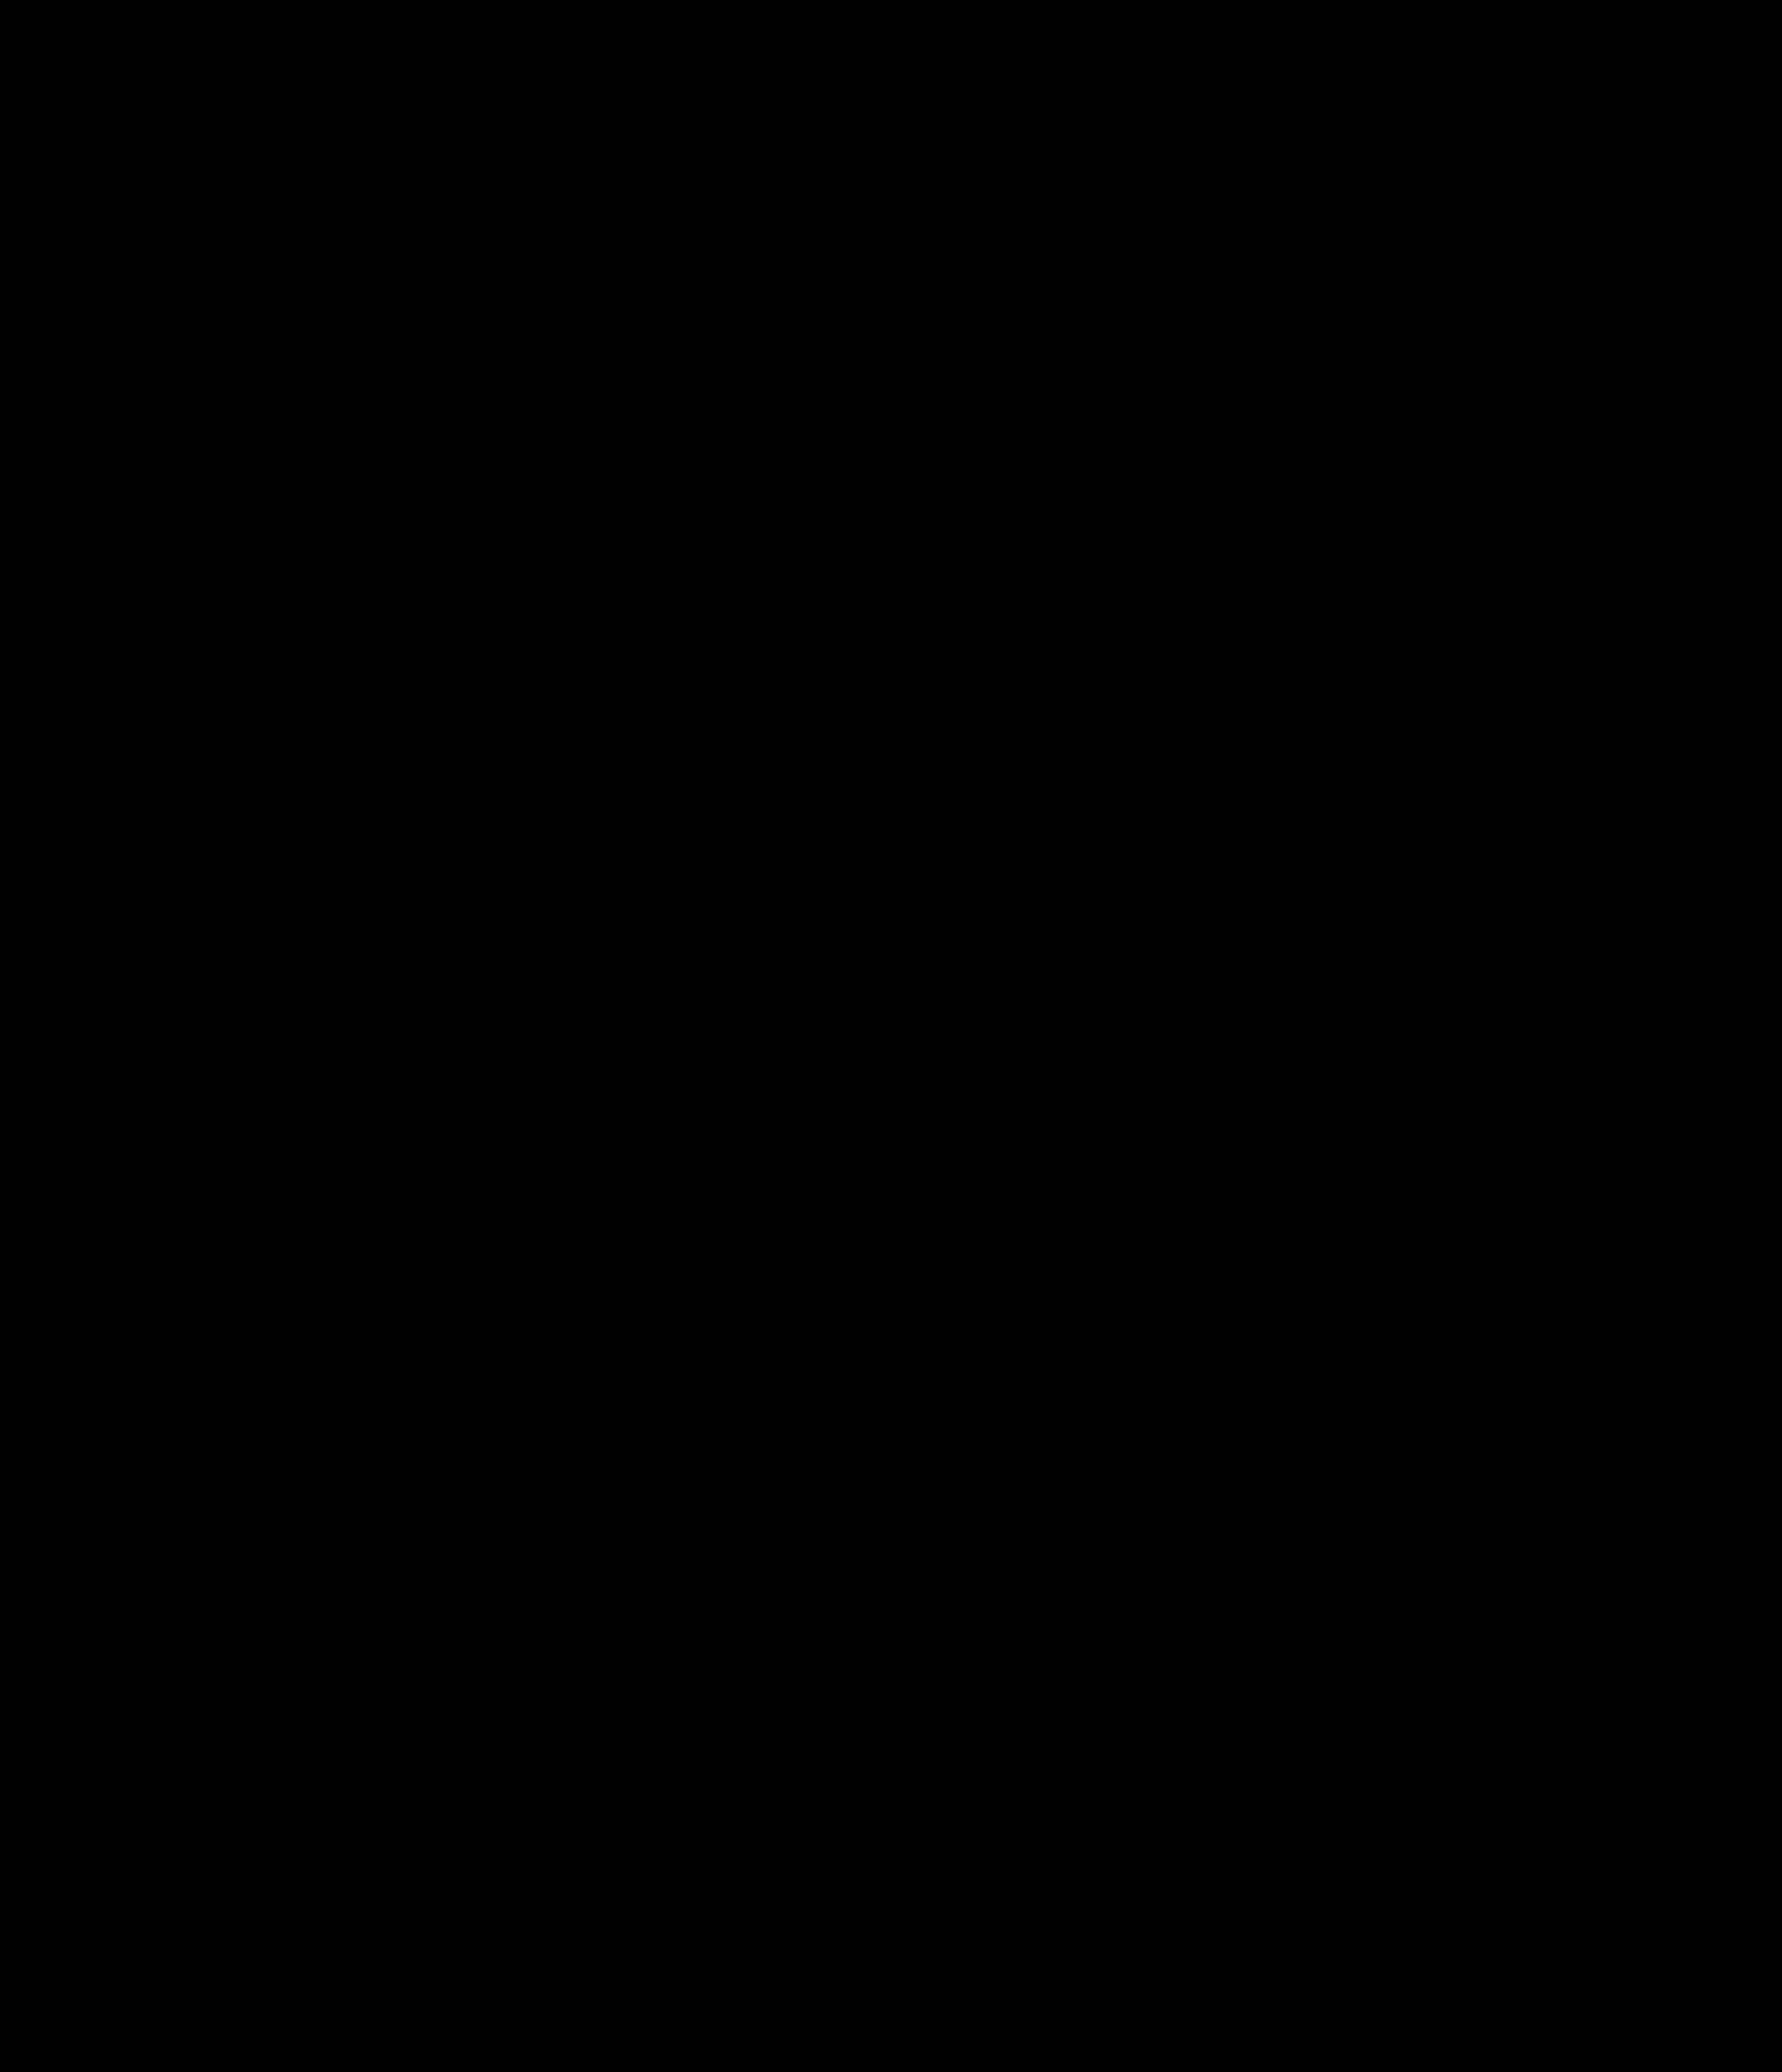 Armenian dram